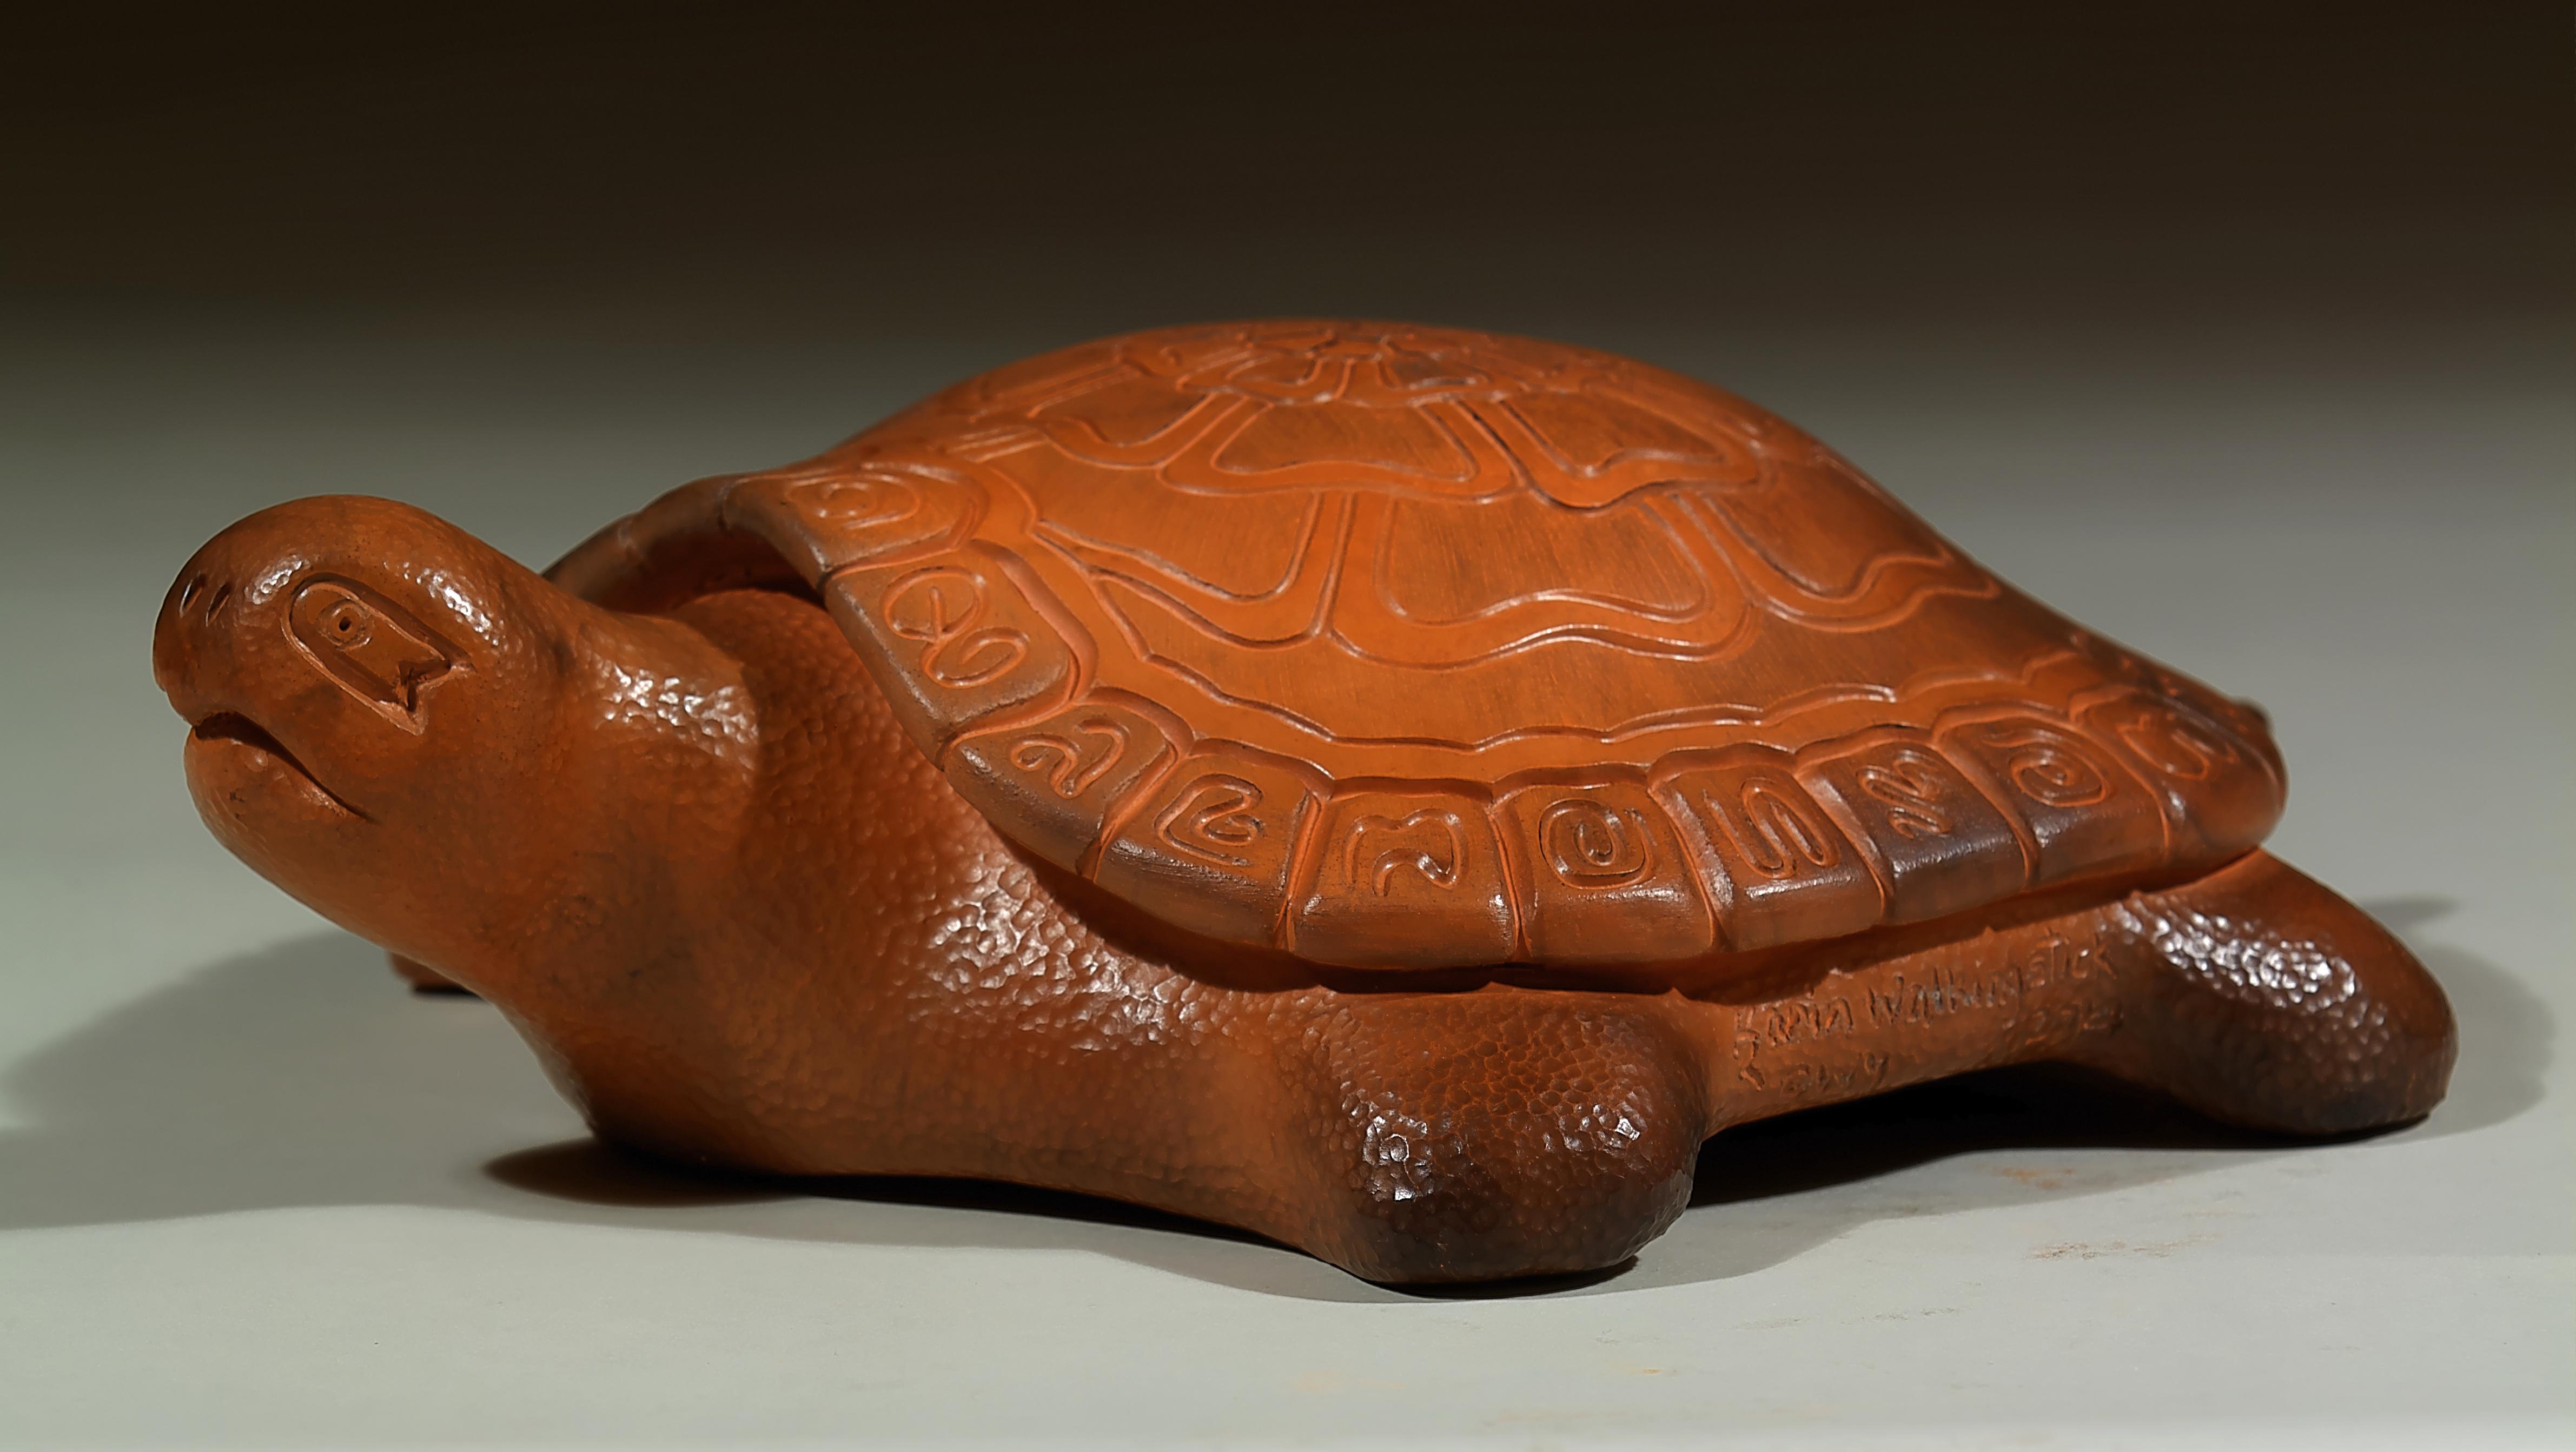 072-Flower Turtle